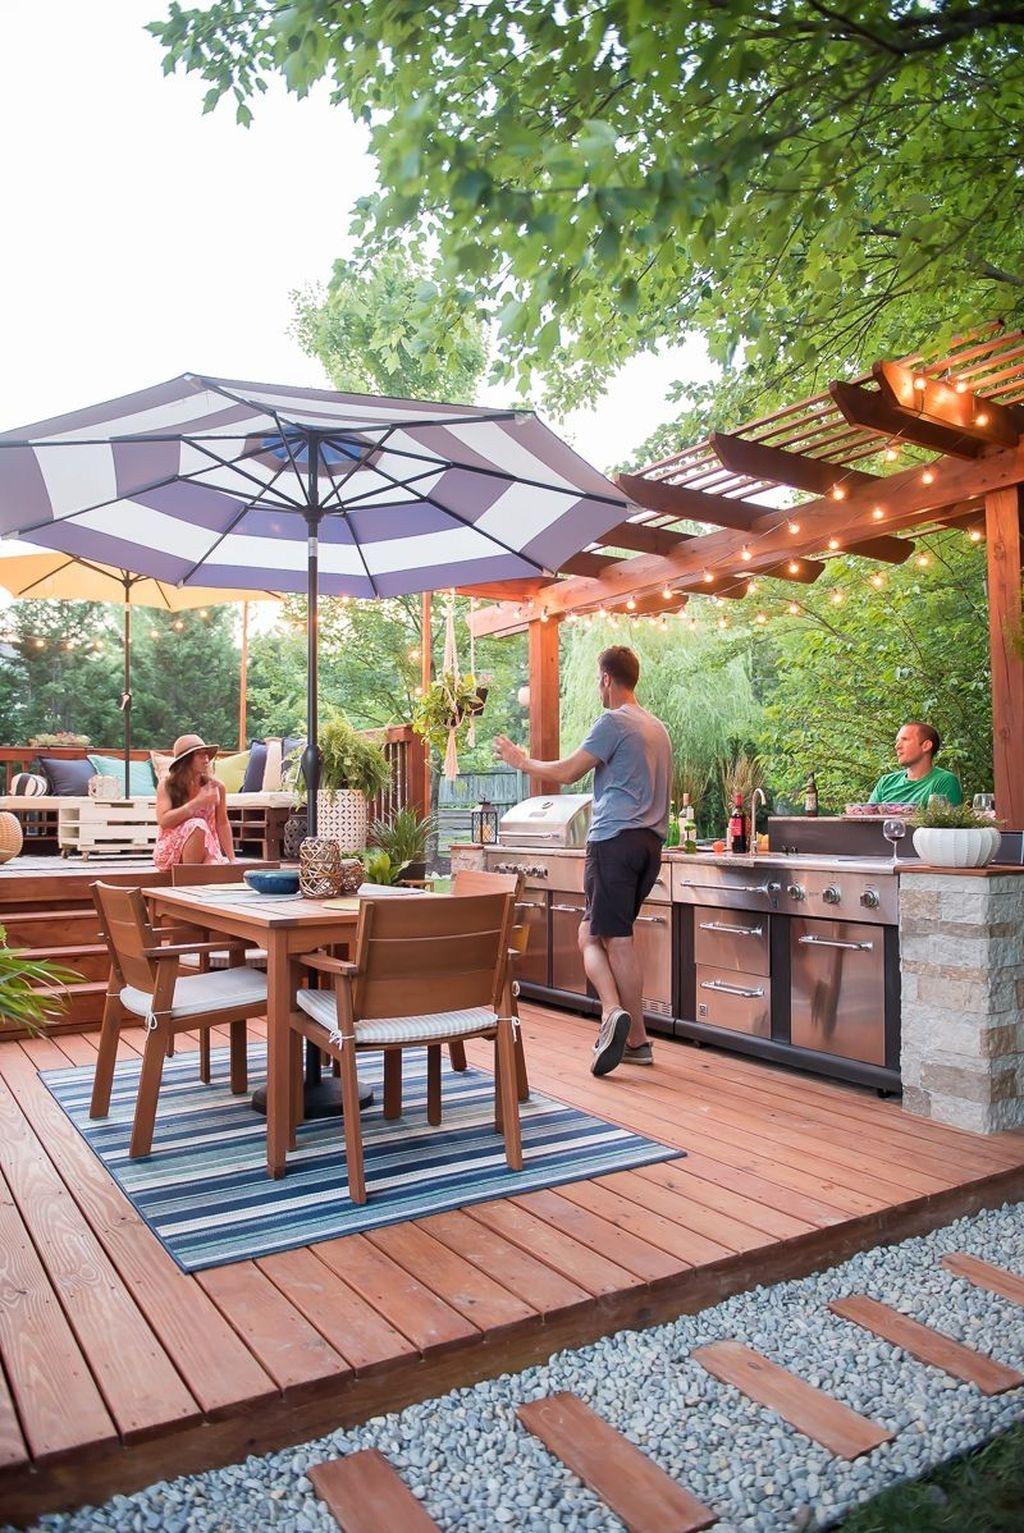 38 cool outdoor kitchen design ideas 13 outdoor kitchen bars outdoor kitchen design diy on outdoor kitchen diy id=17767